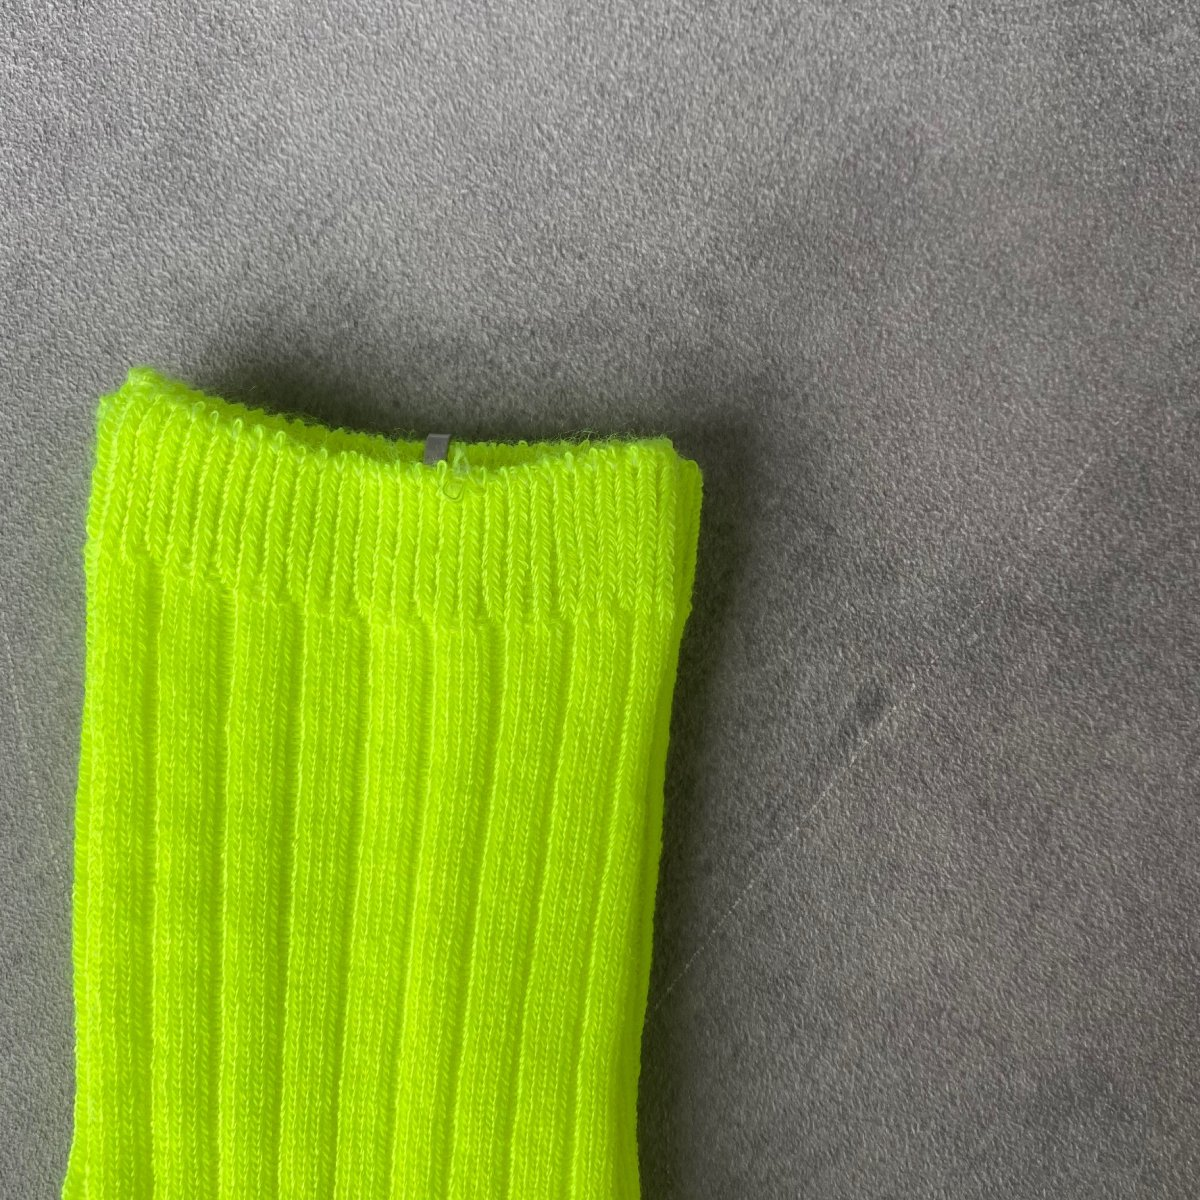 【BABY】Neon Socks 詳細画像9